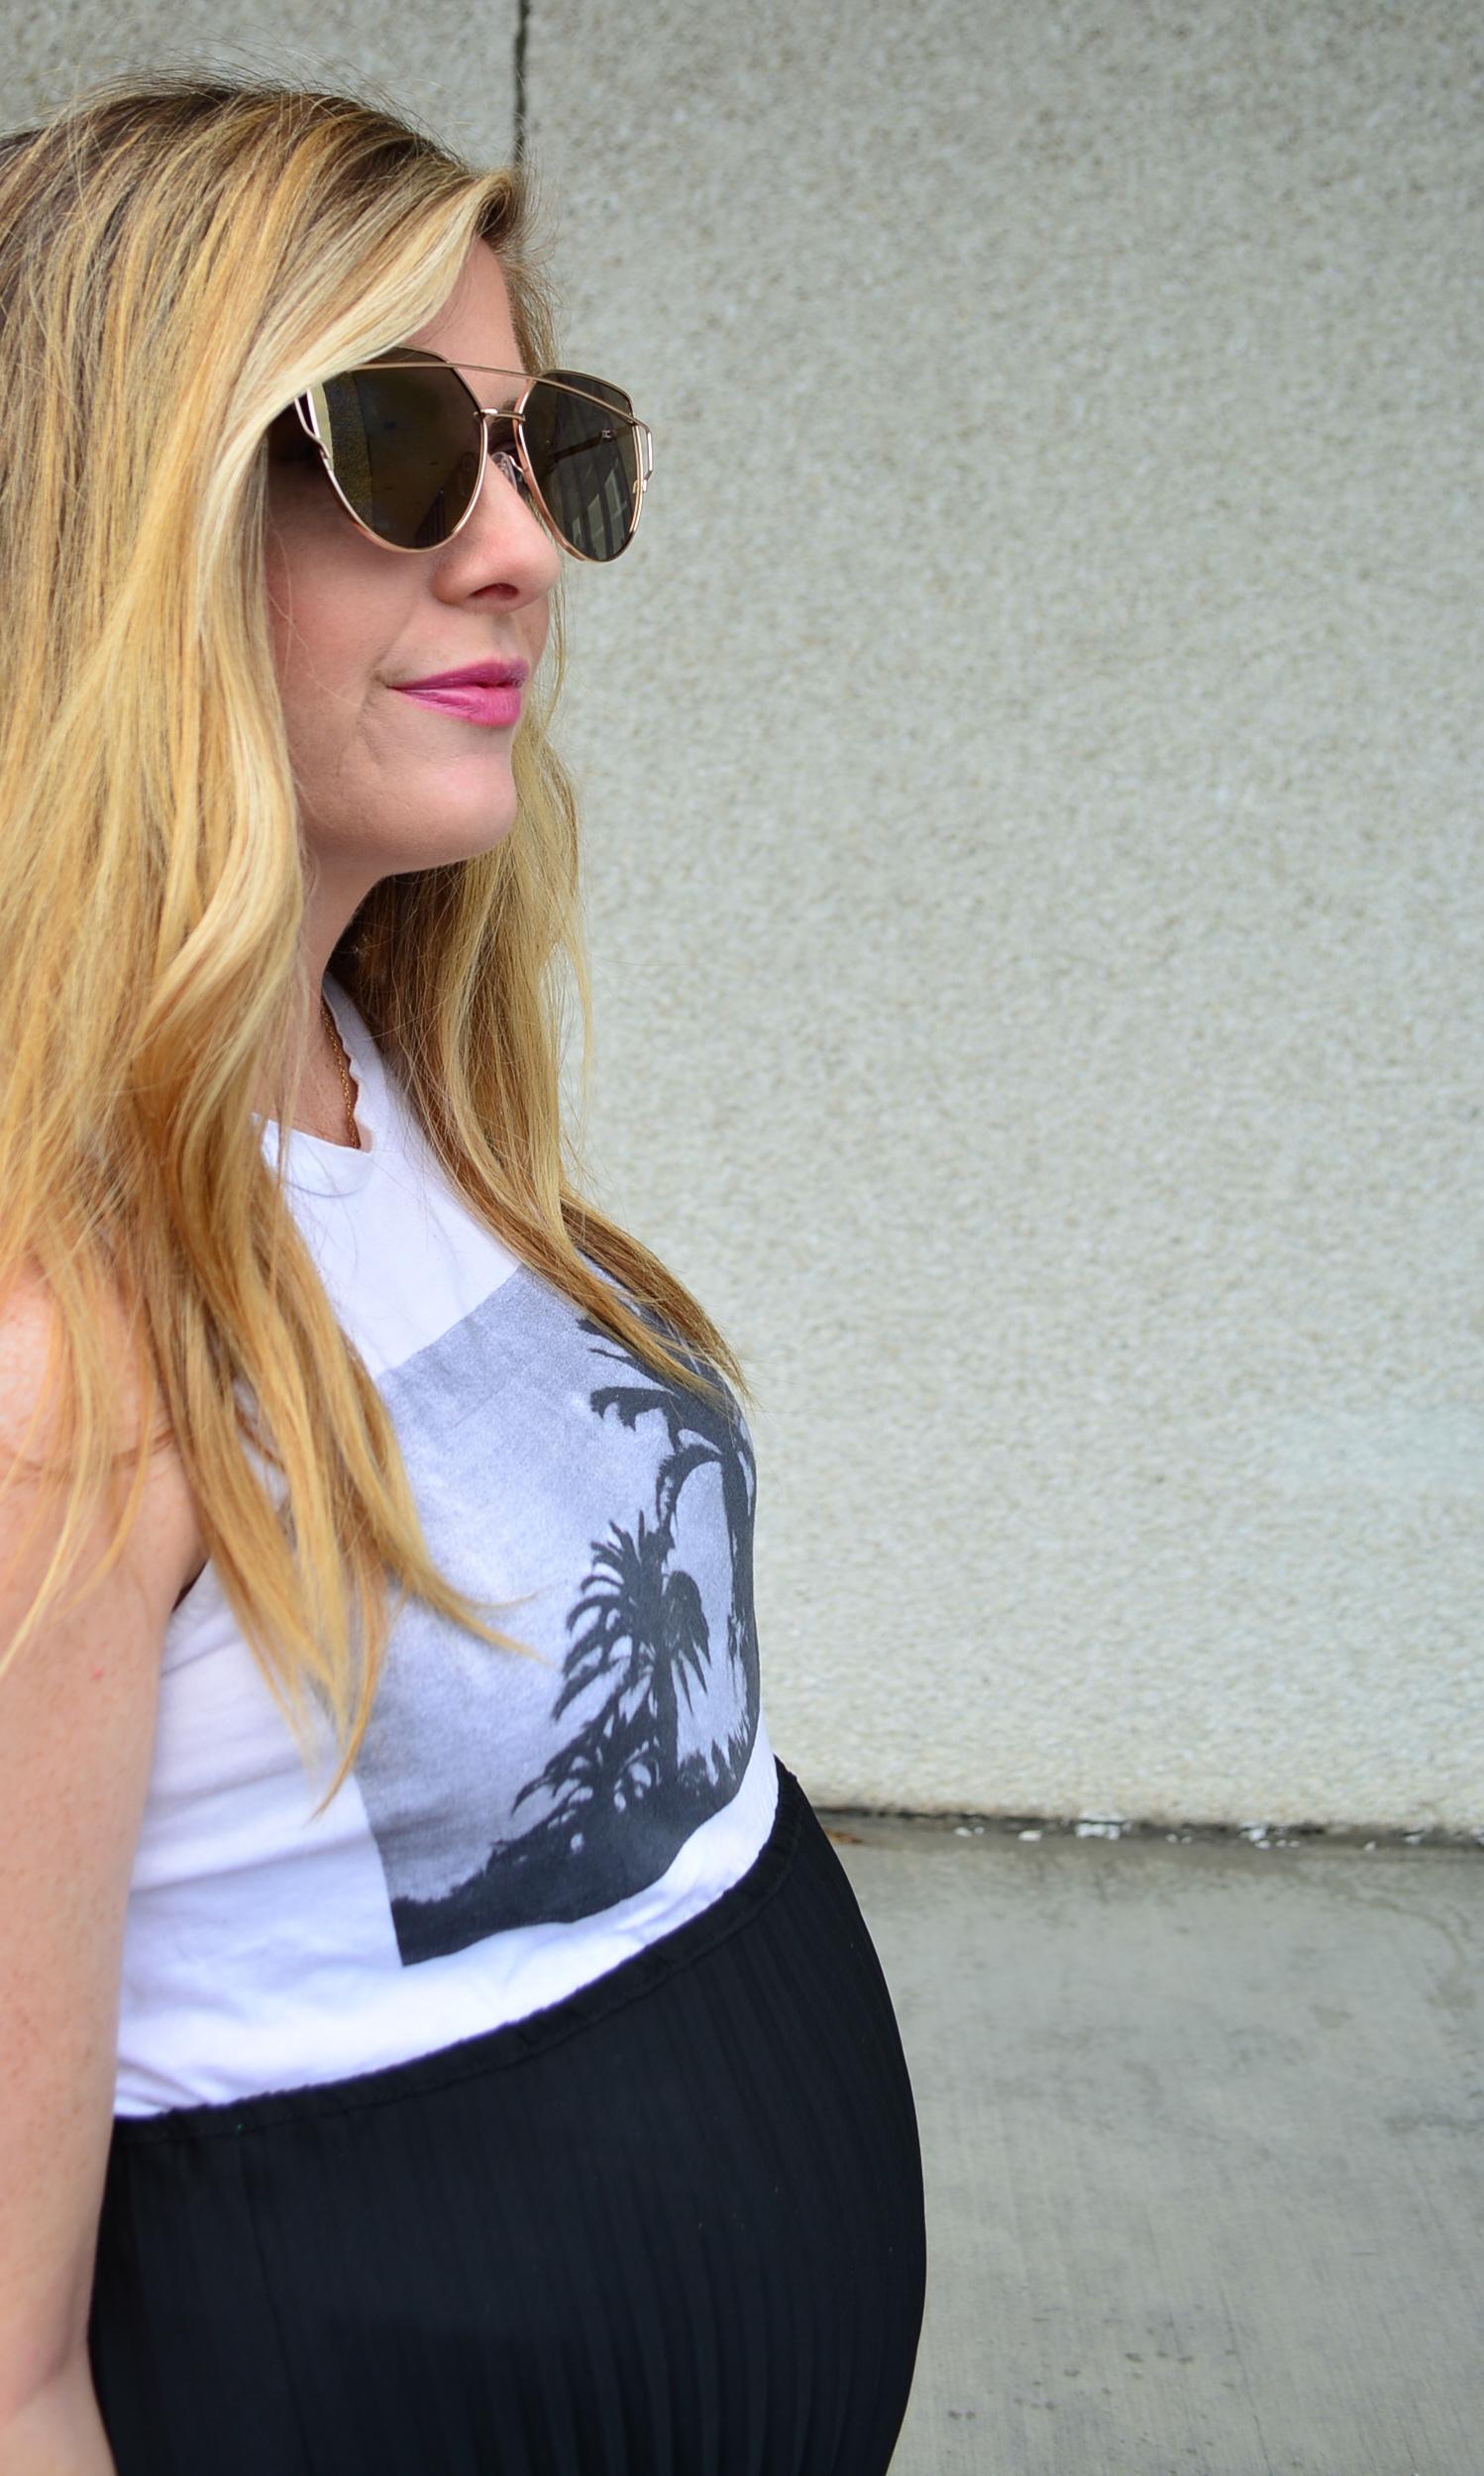 Baldwin tank and black midi skirt for a summer maternity look